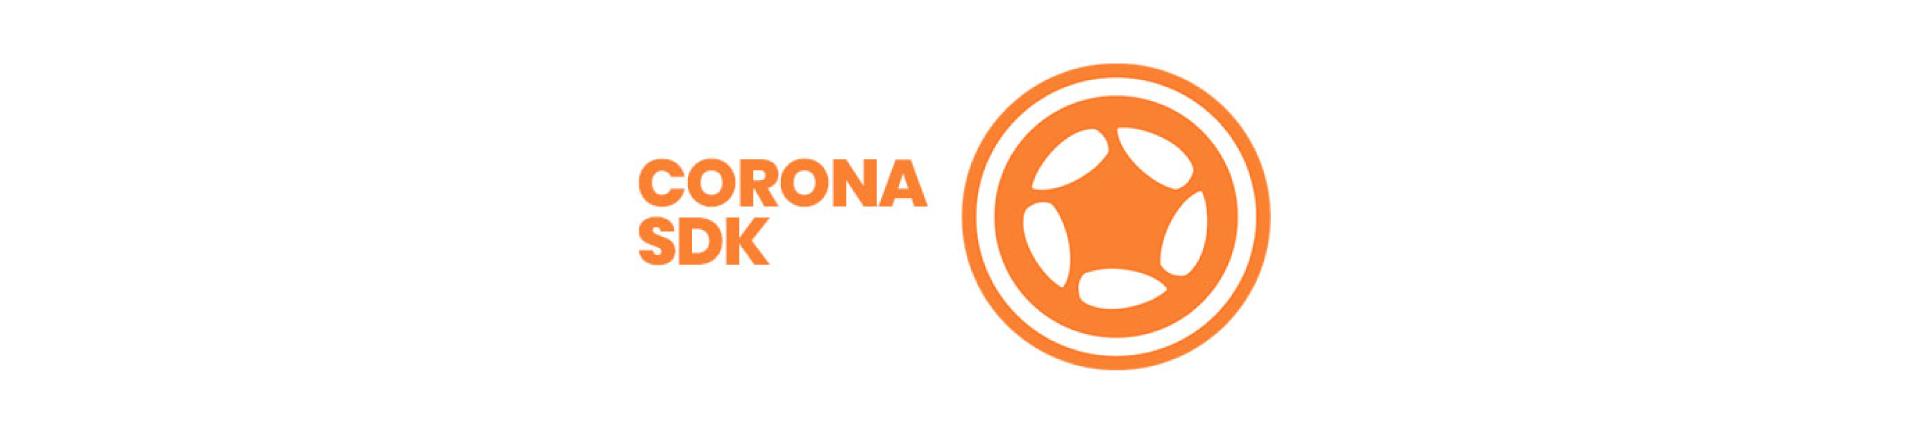 corona sdk cross platform game development